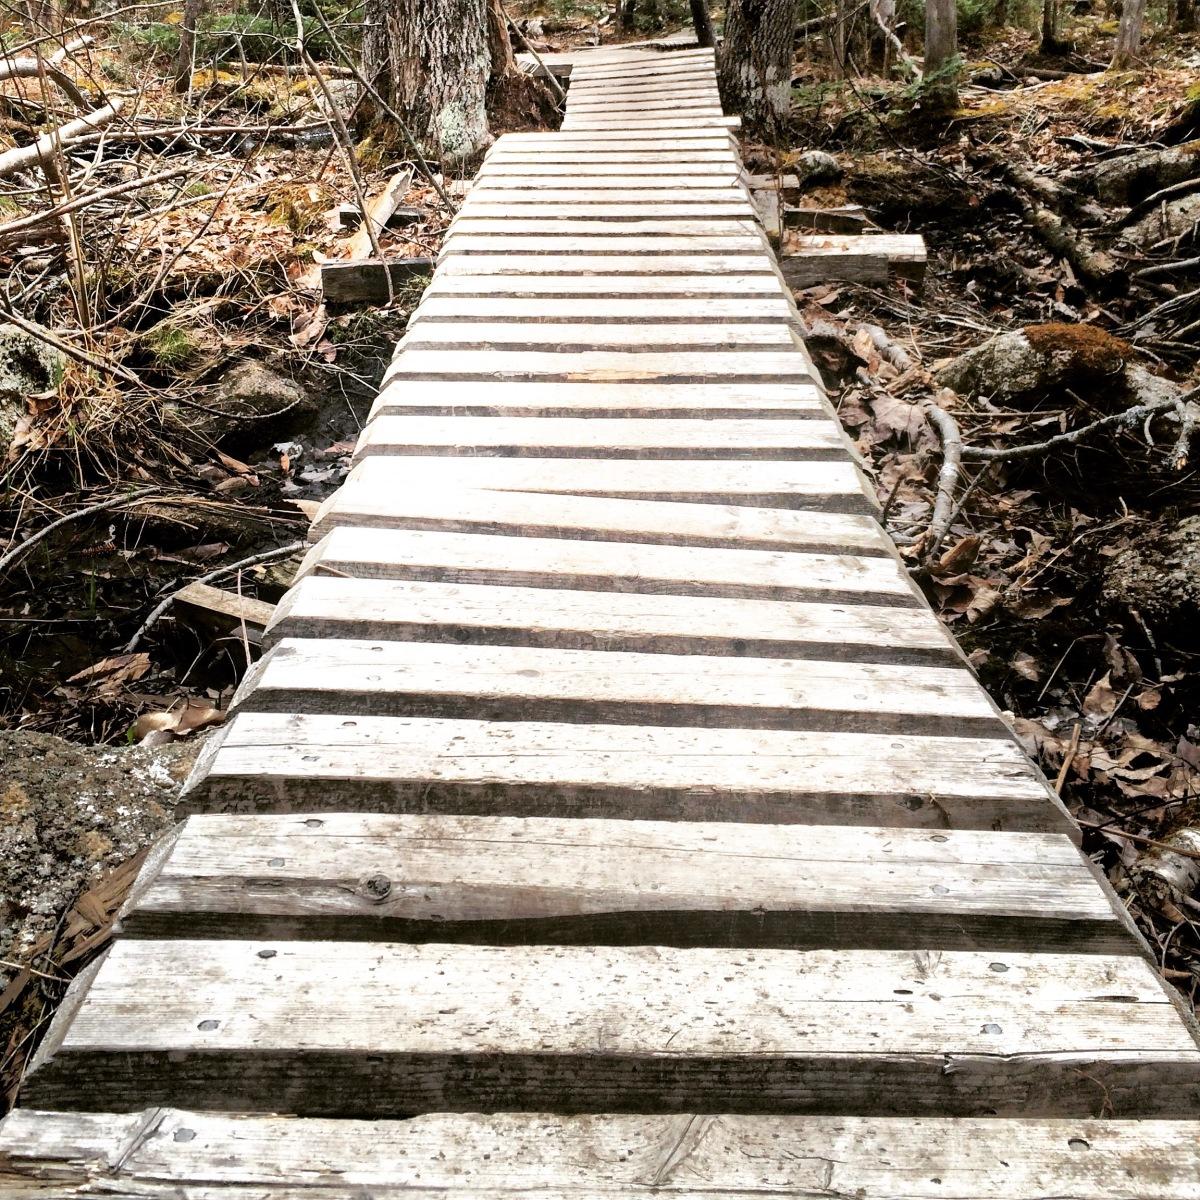 Long Lake Provincial Park new Lakeview Trail dog-friendly